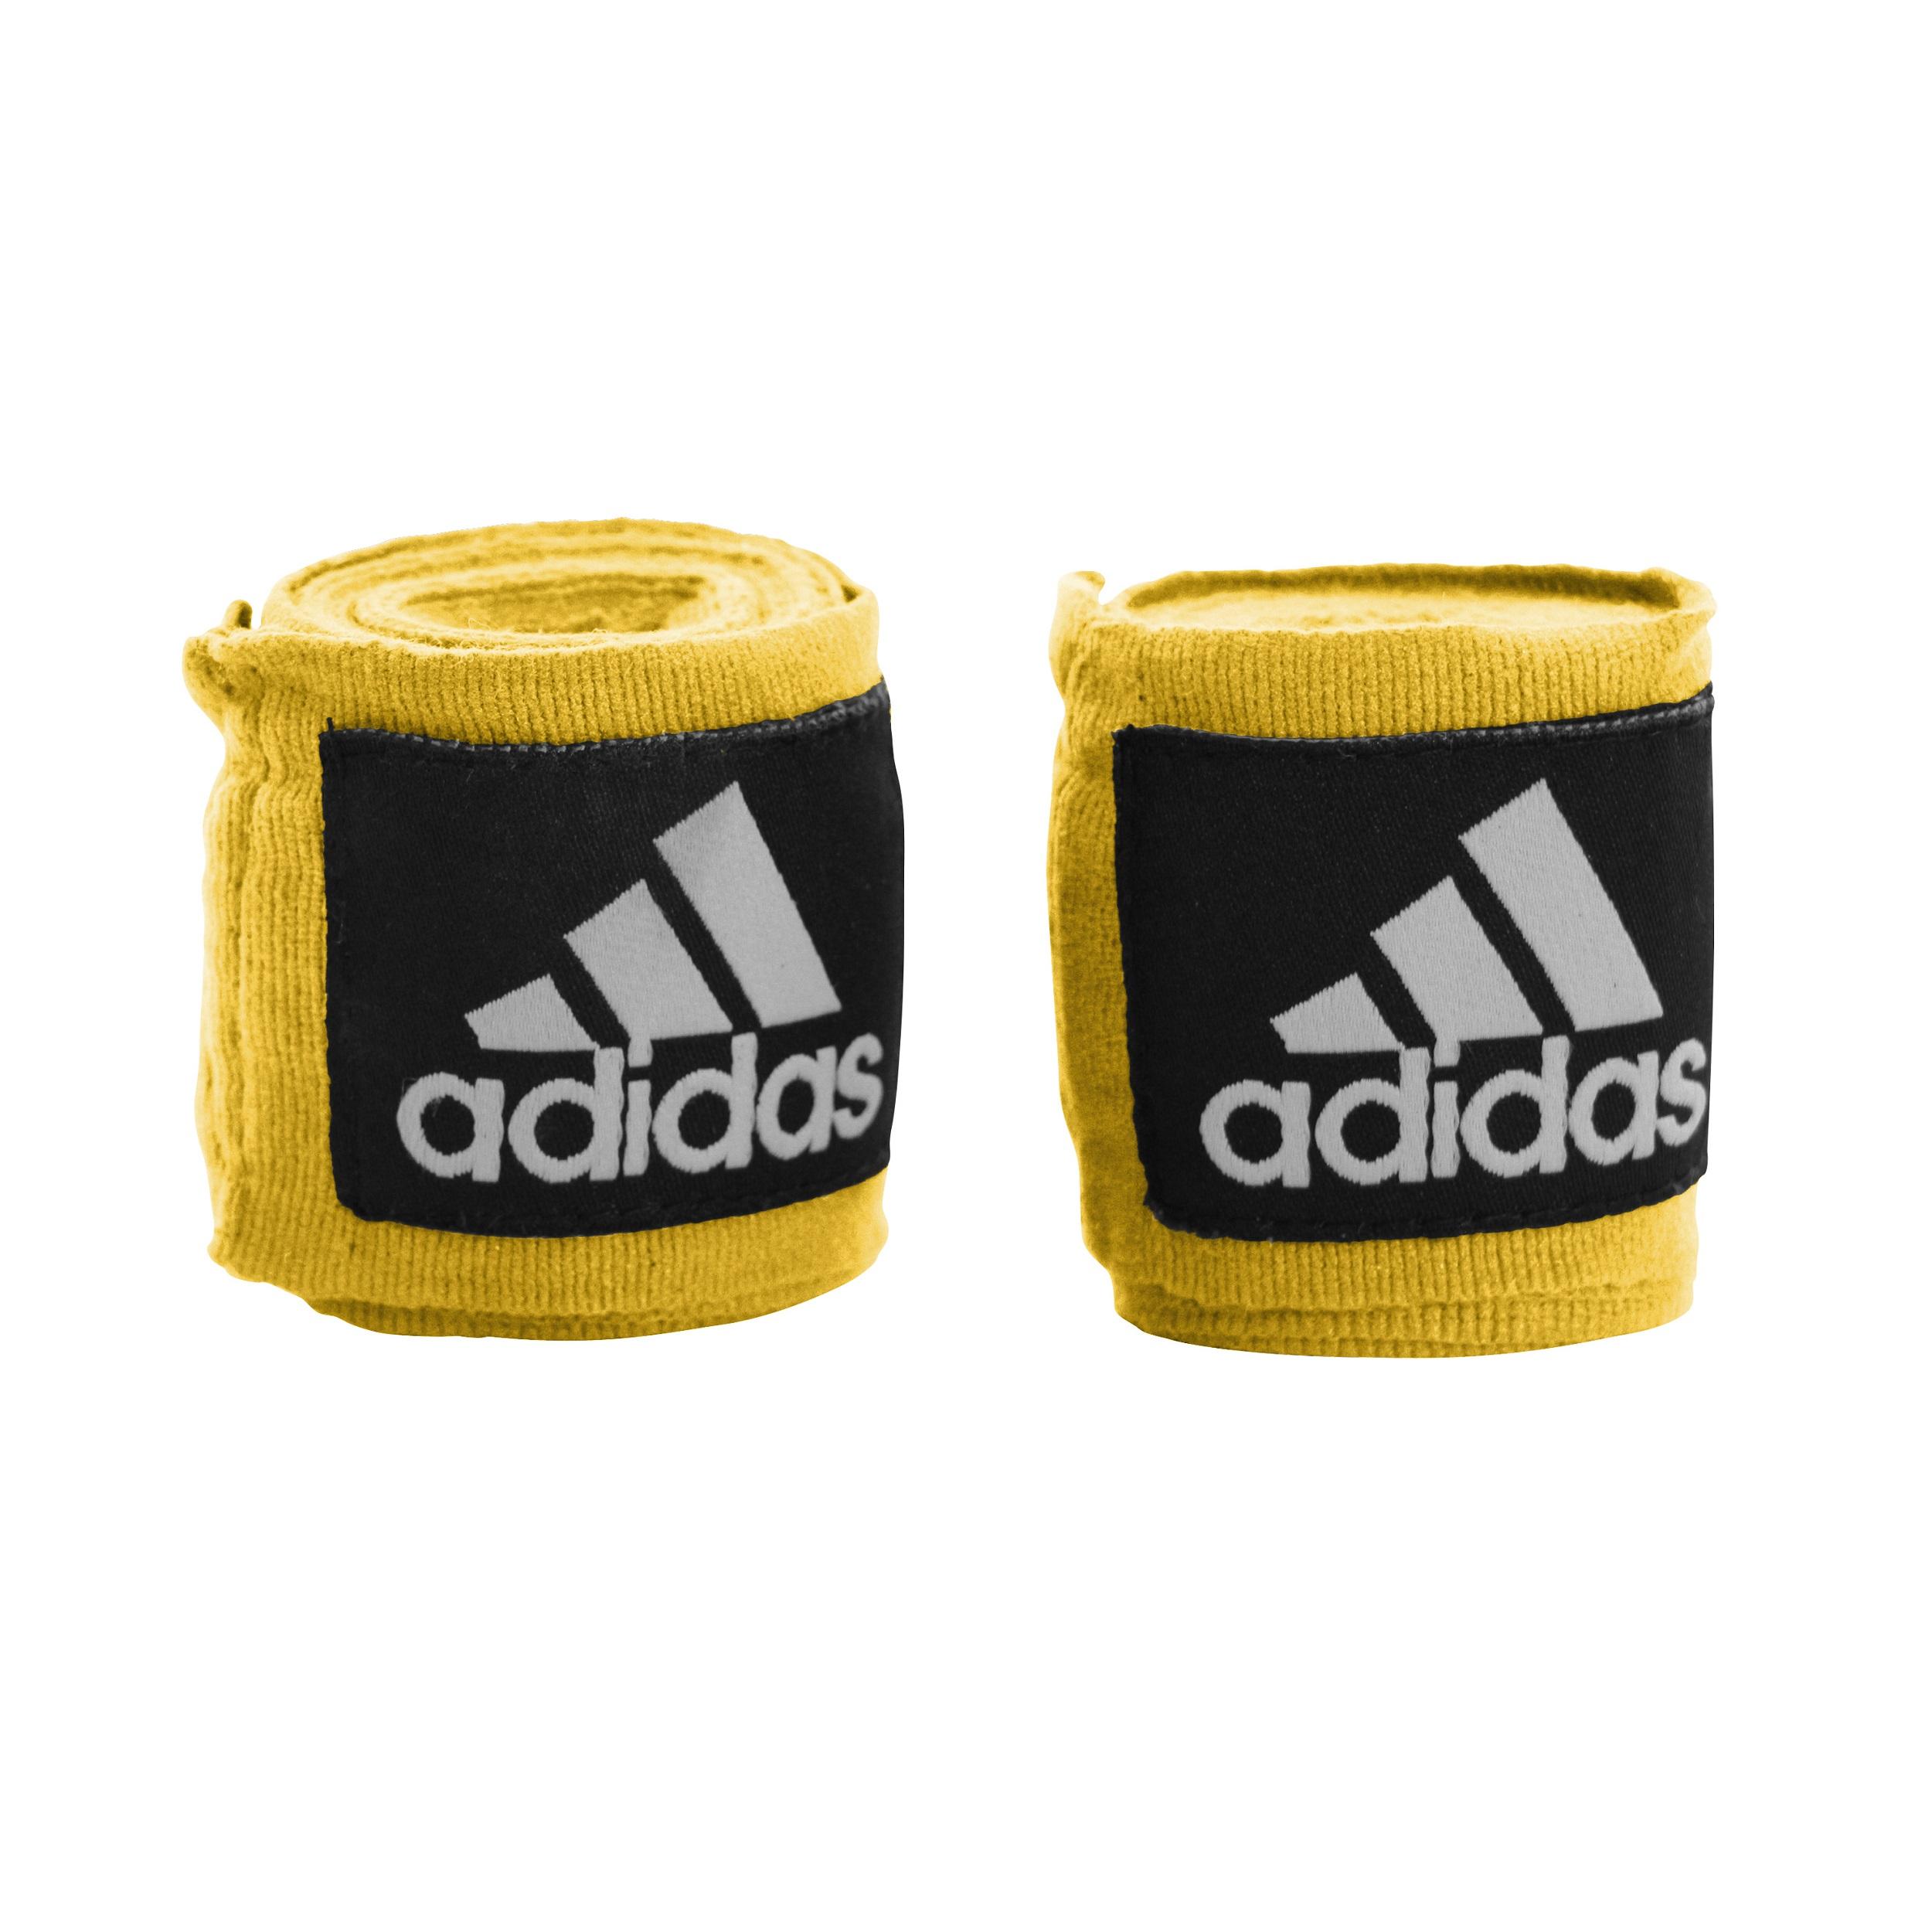 Adidas Bandages - Geel - 255 cm